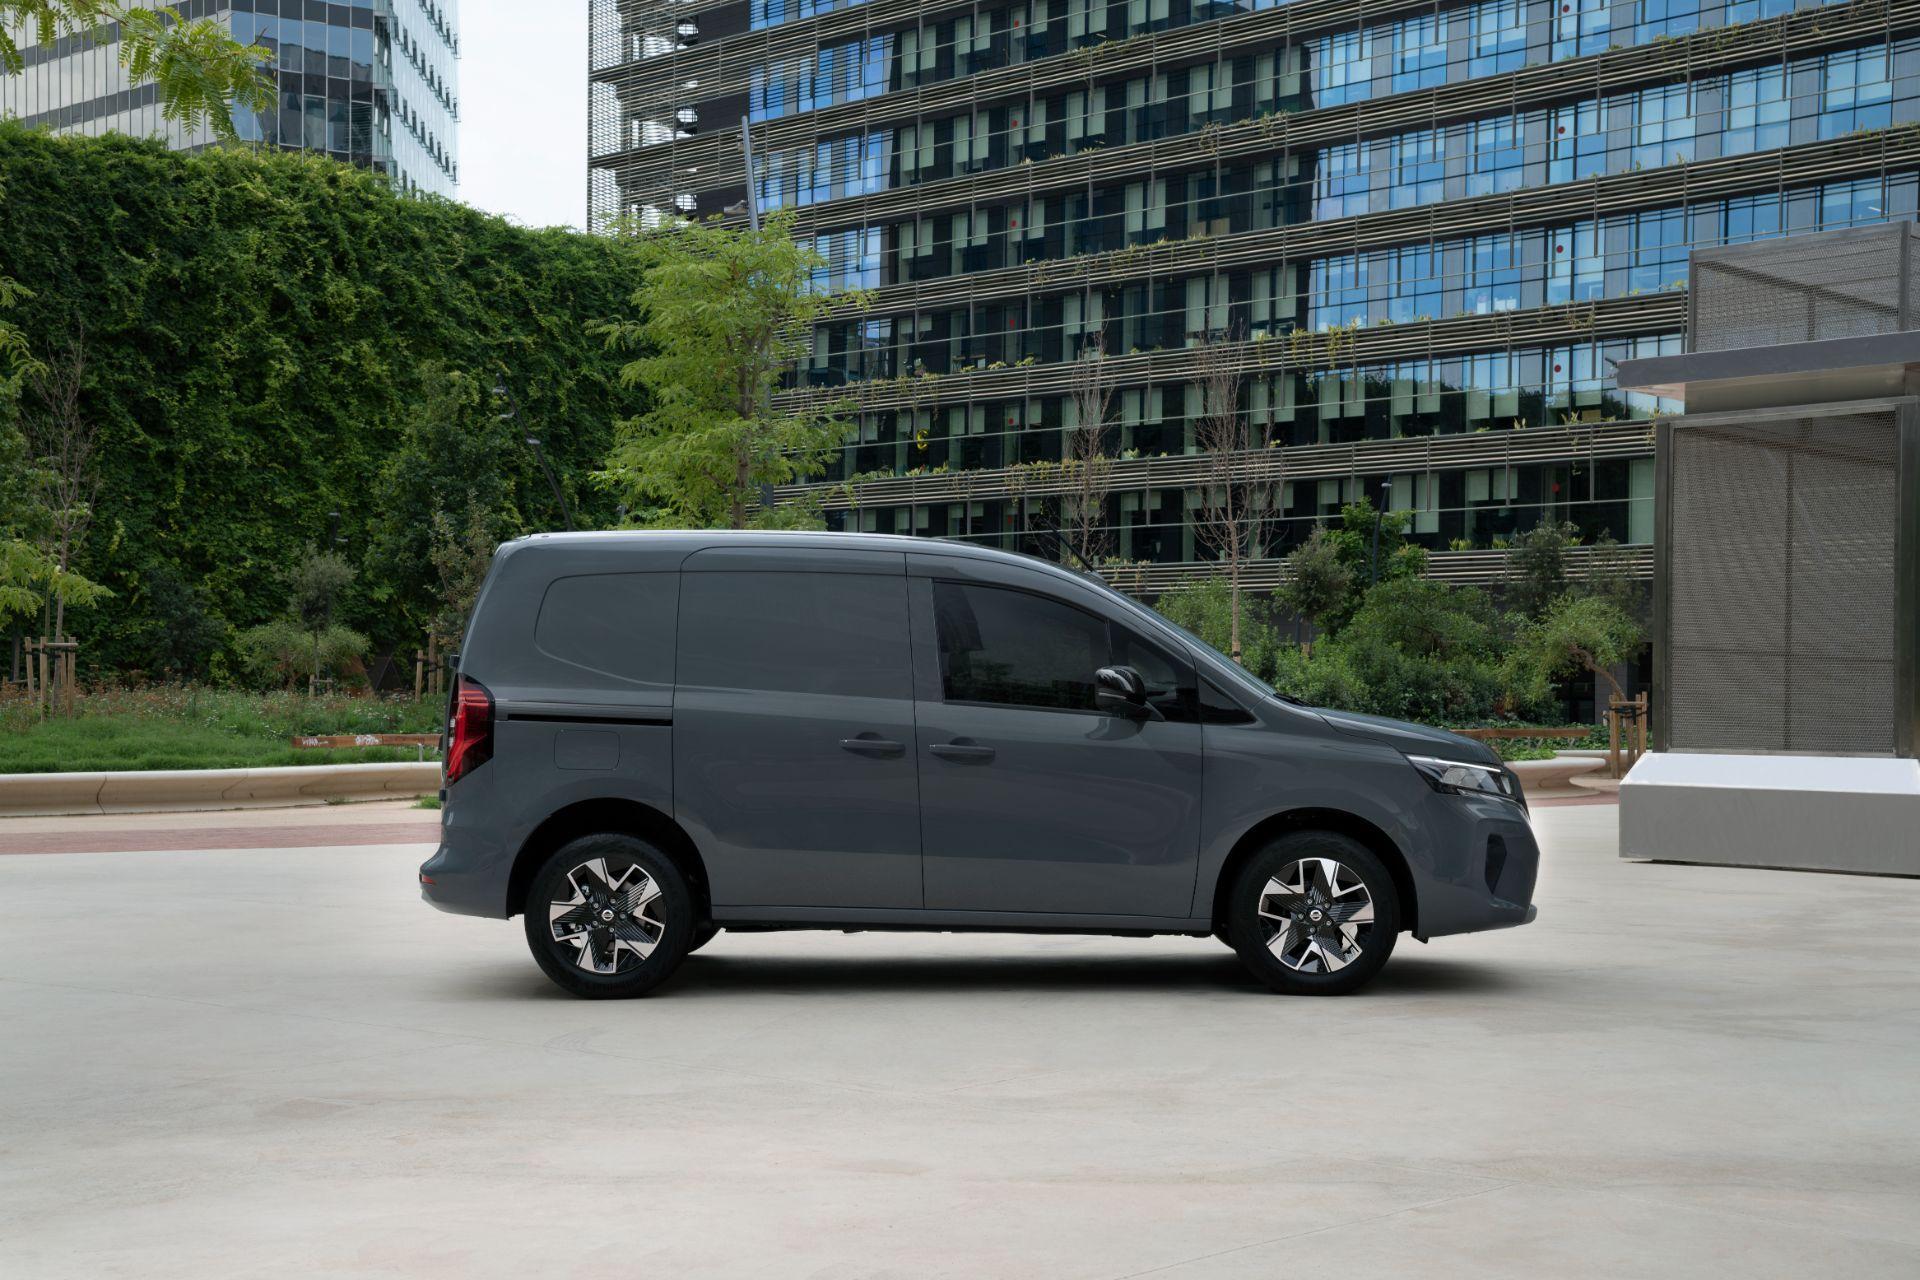 2022-Nissan-Townstar-petrol-van-dynamic-12